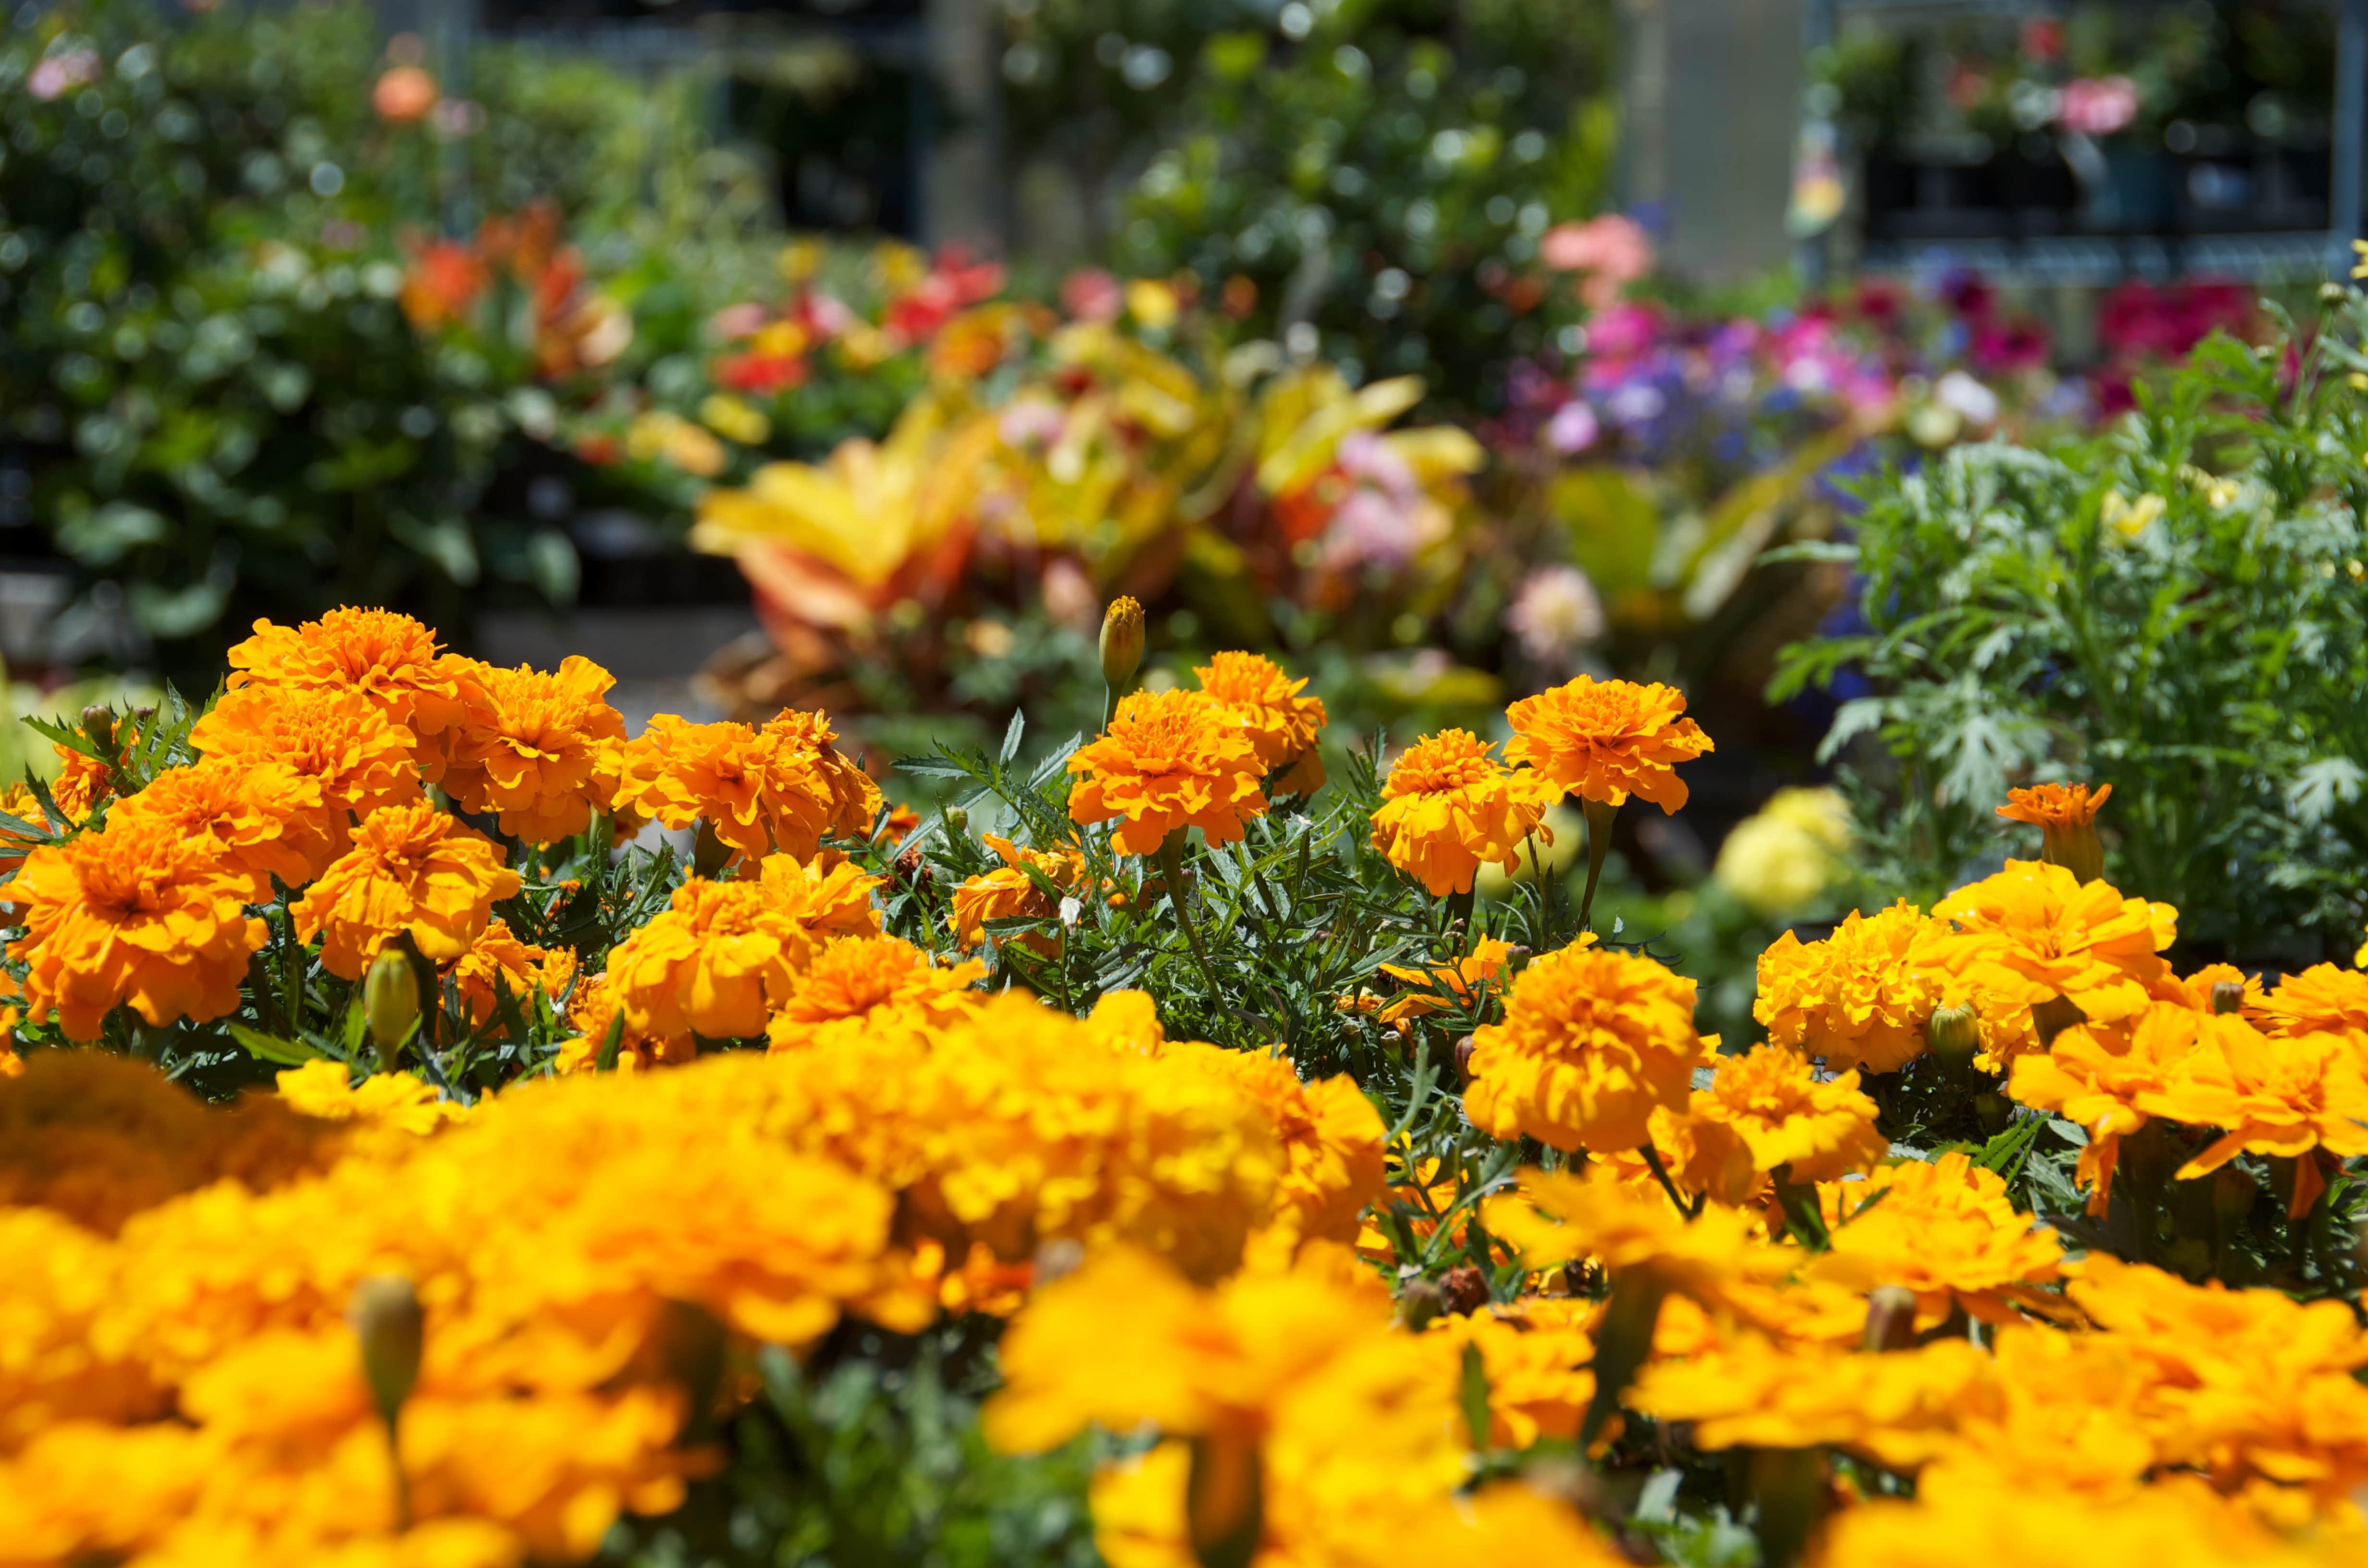 Annual and perennial flowers pittsburgh pa best feeds garden annual flowers best feeds garden centers gibsonia pa pittsburgh pa izmirmasajfo